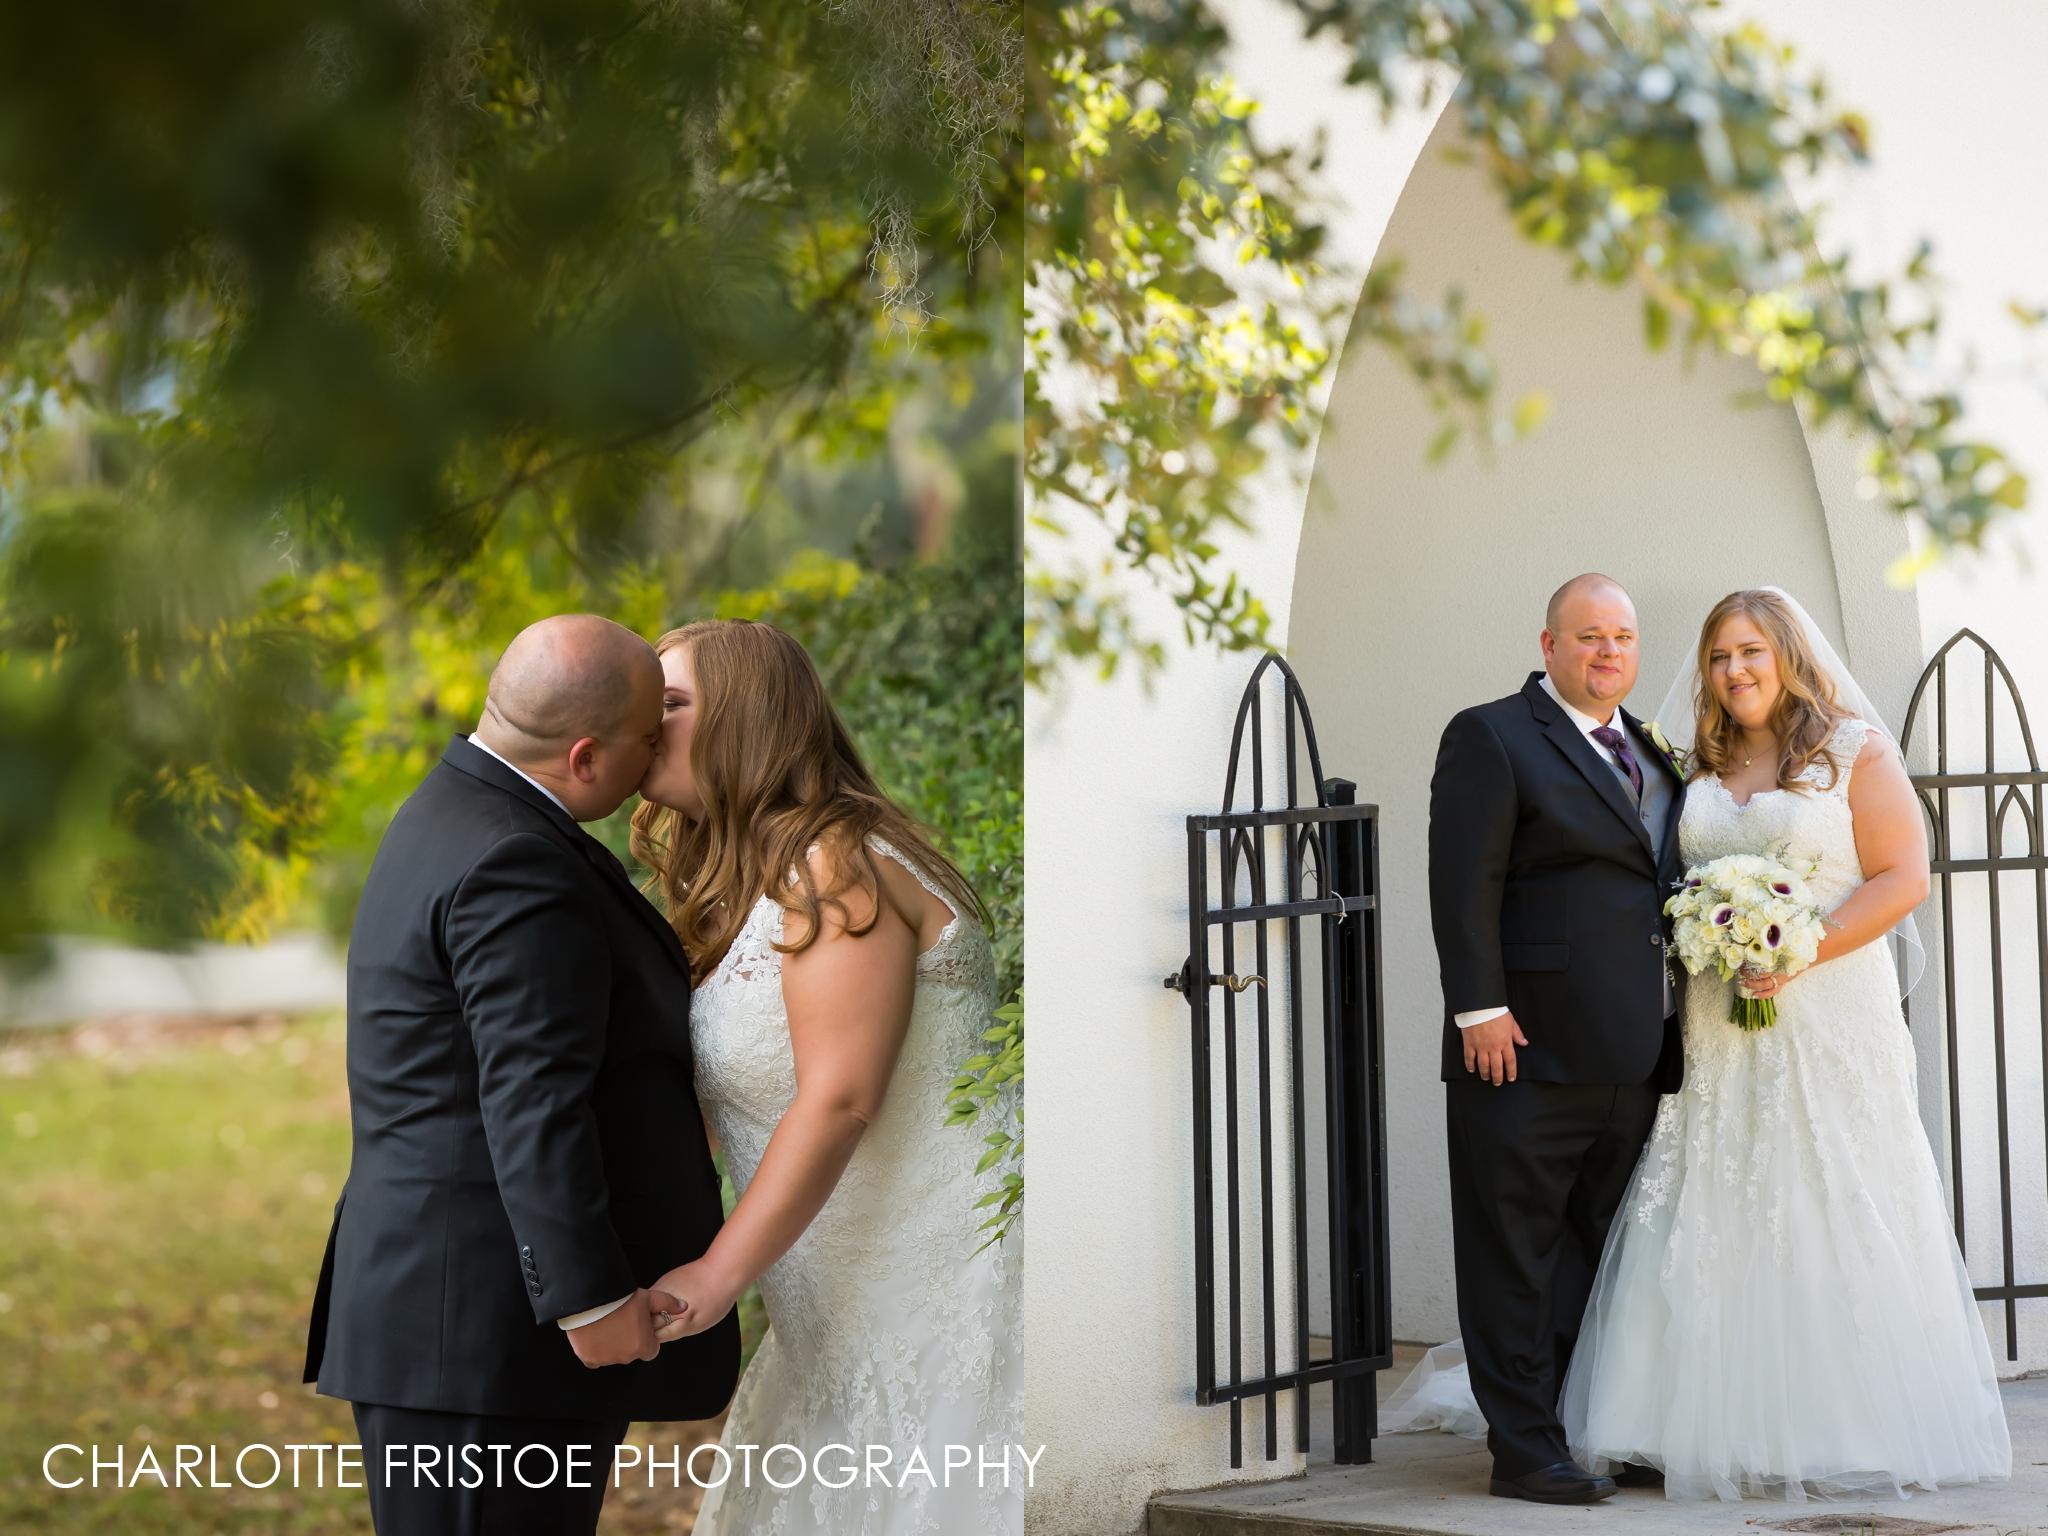 Charlotte Fristoe Photography-6.jpg